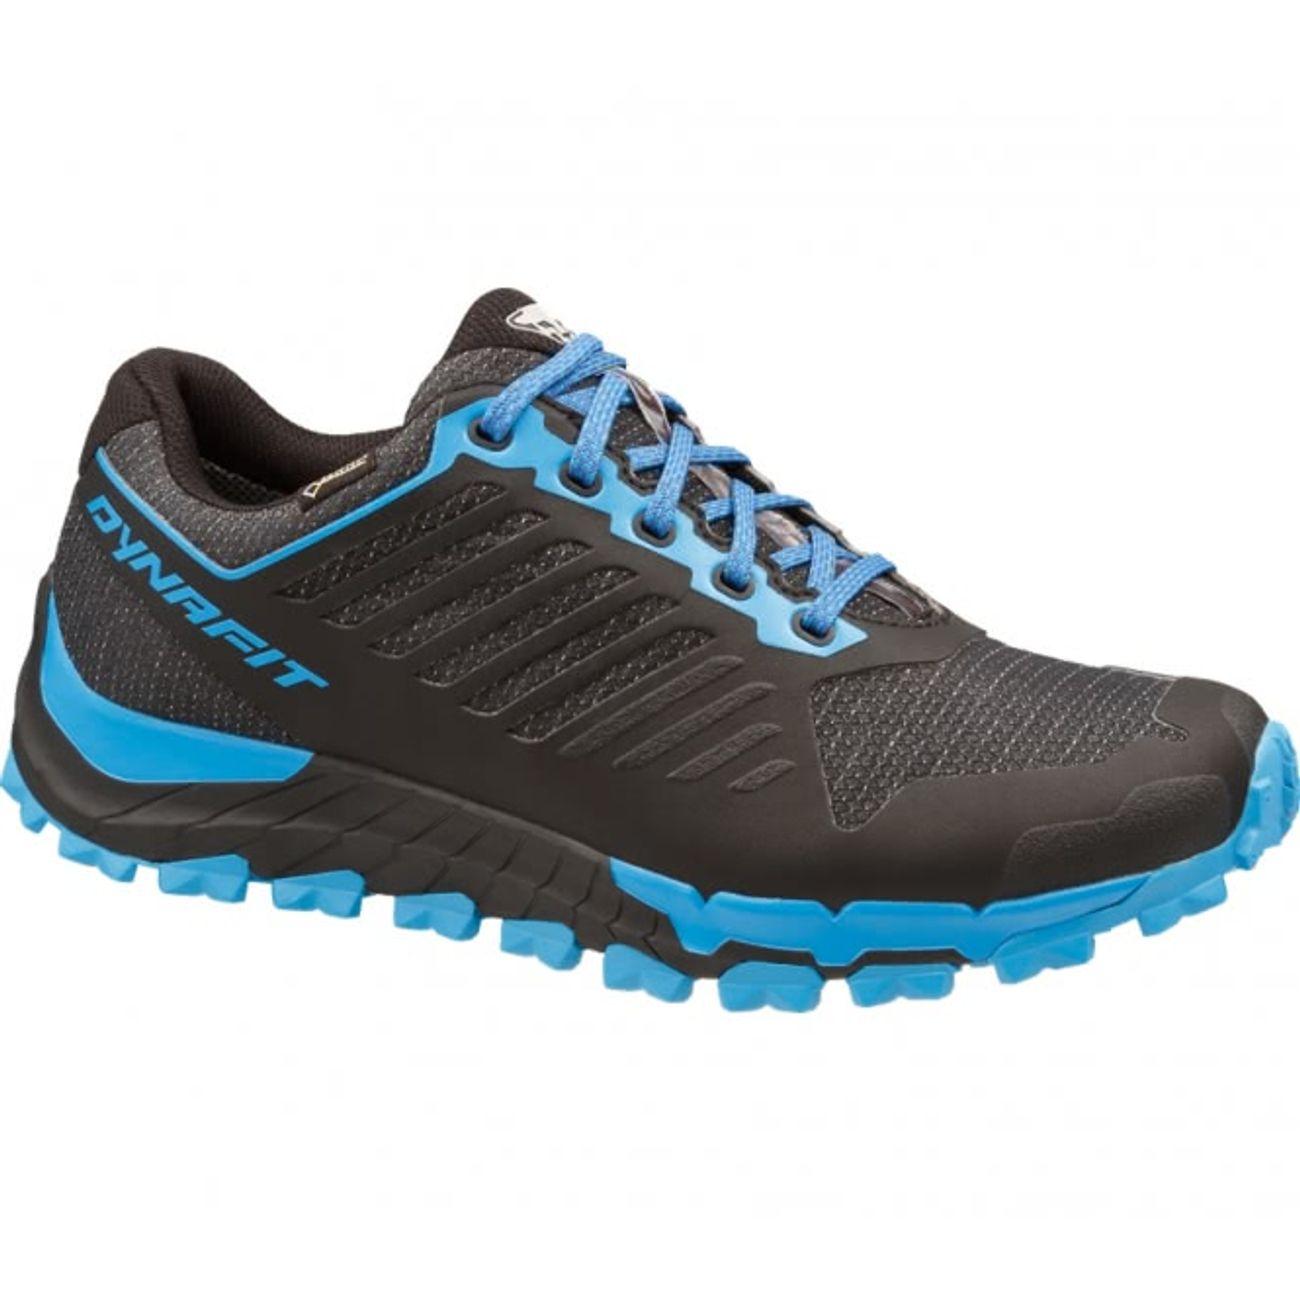 Dynafit Trailbreaker Chaussures de Fitness Homme